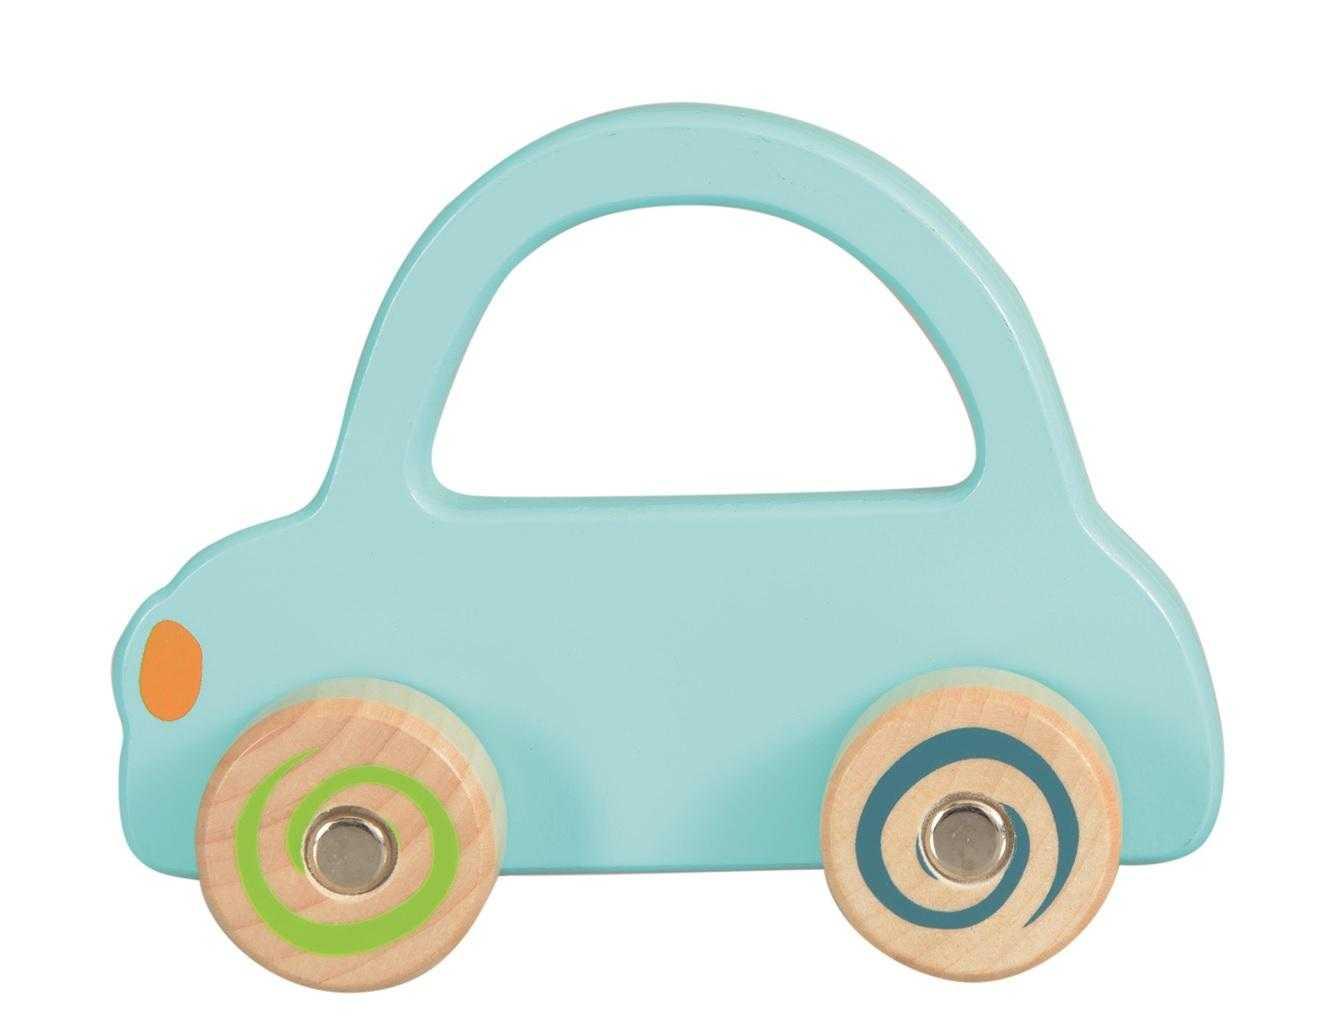 Masinuta lemn albastru deschis egmont toys imagine